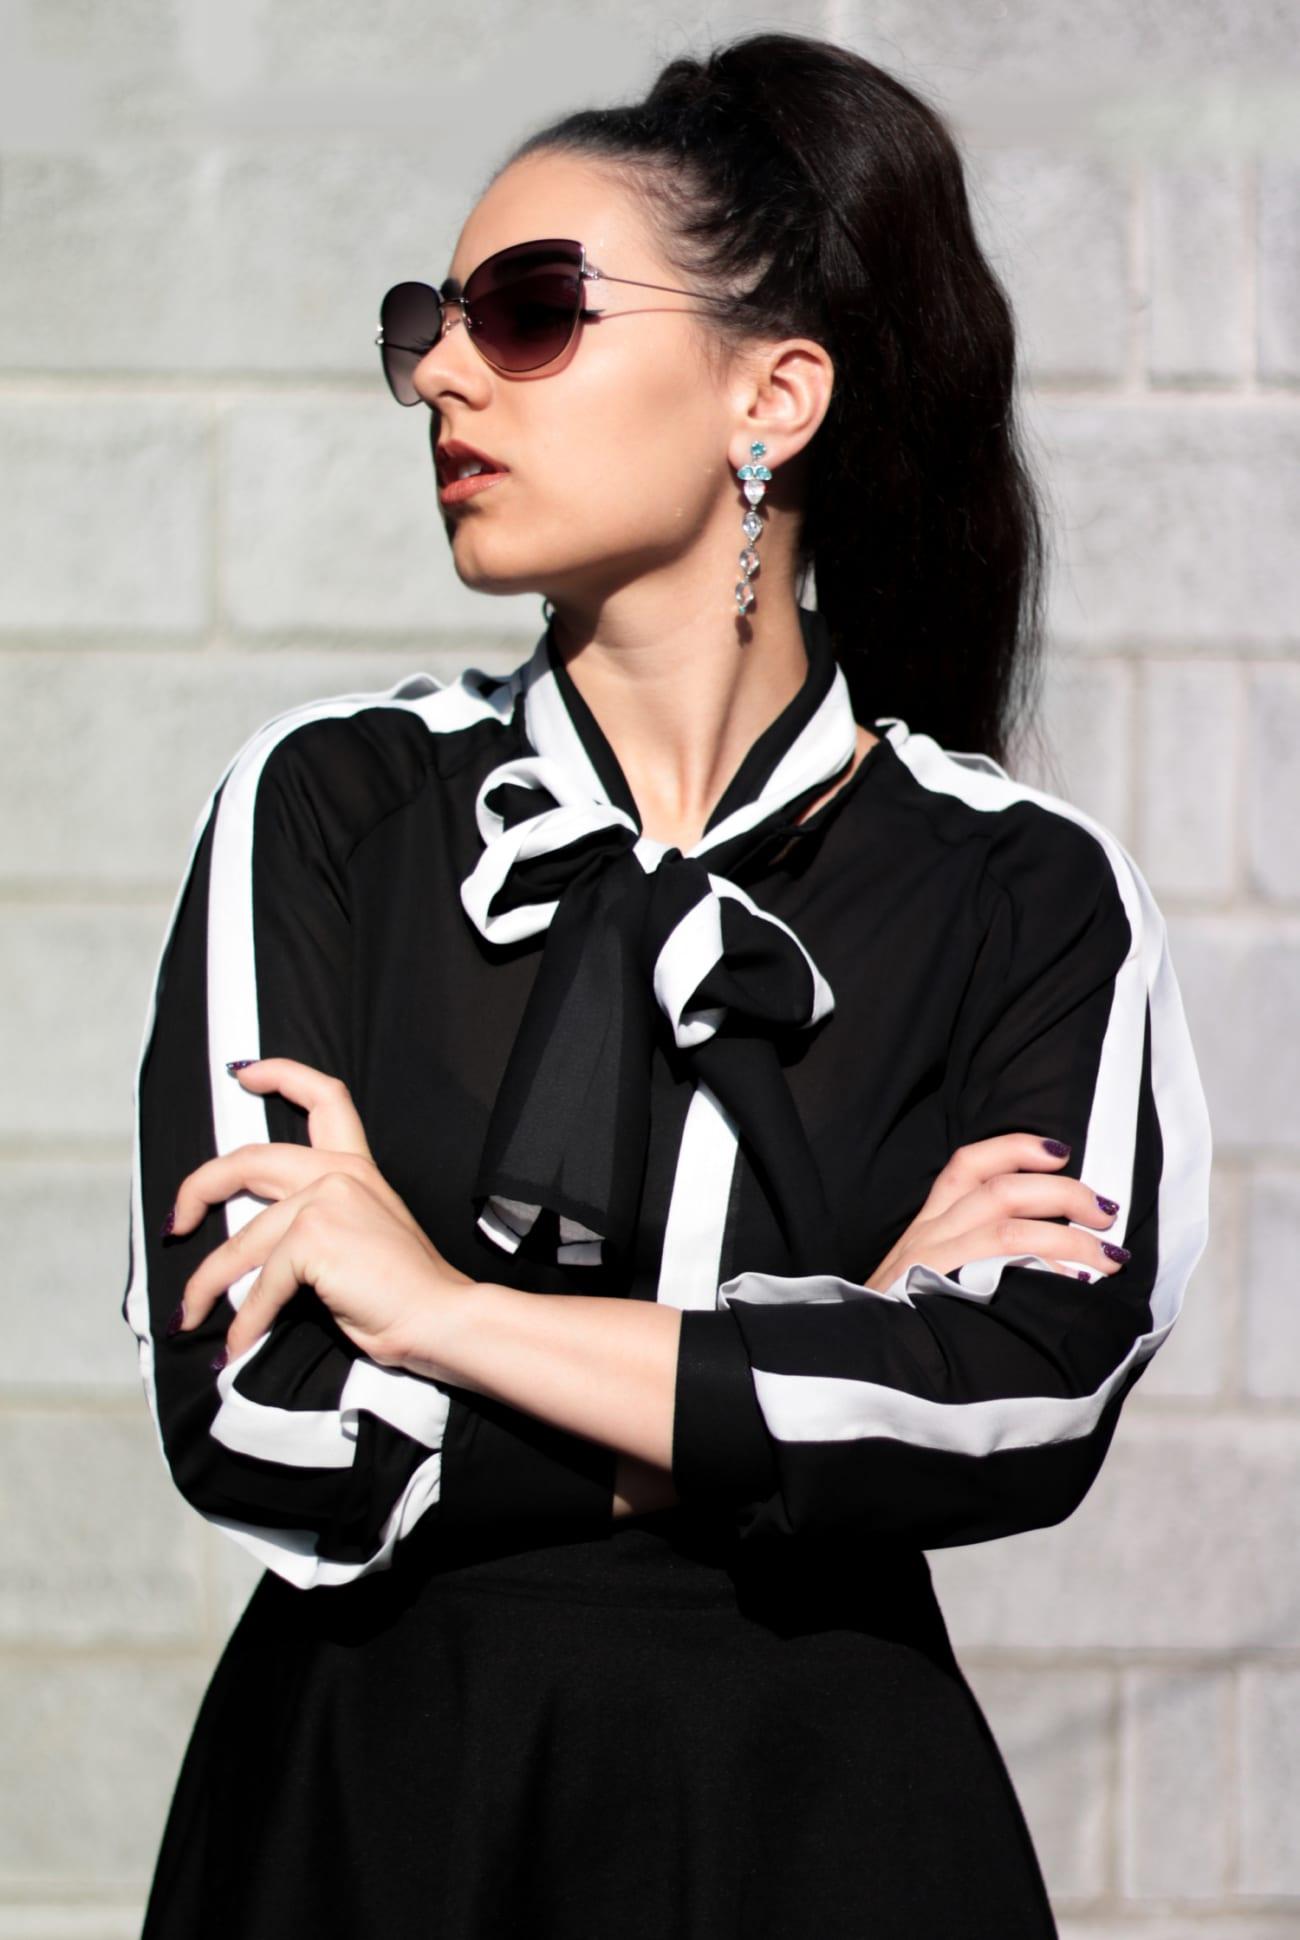 black white shirt camasa alb negru fontita bufanta ieftina online fashion blog outfit camasa eleganta roxi rose (2)